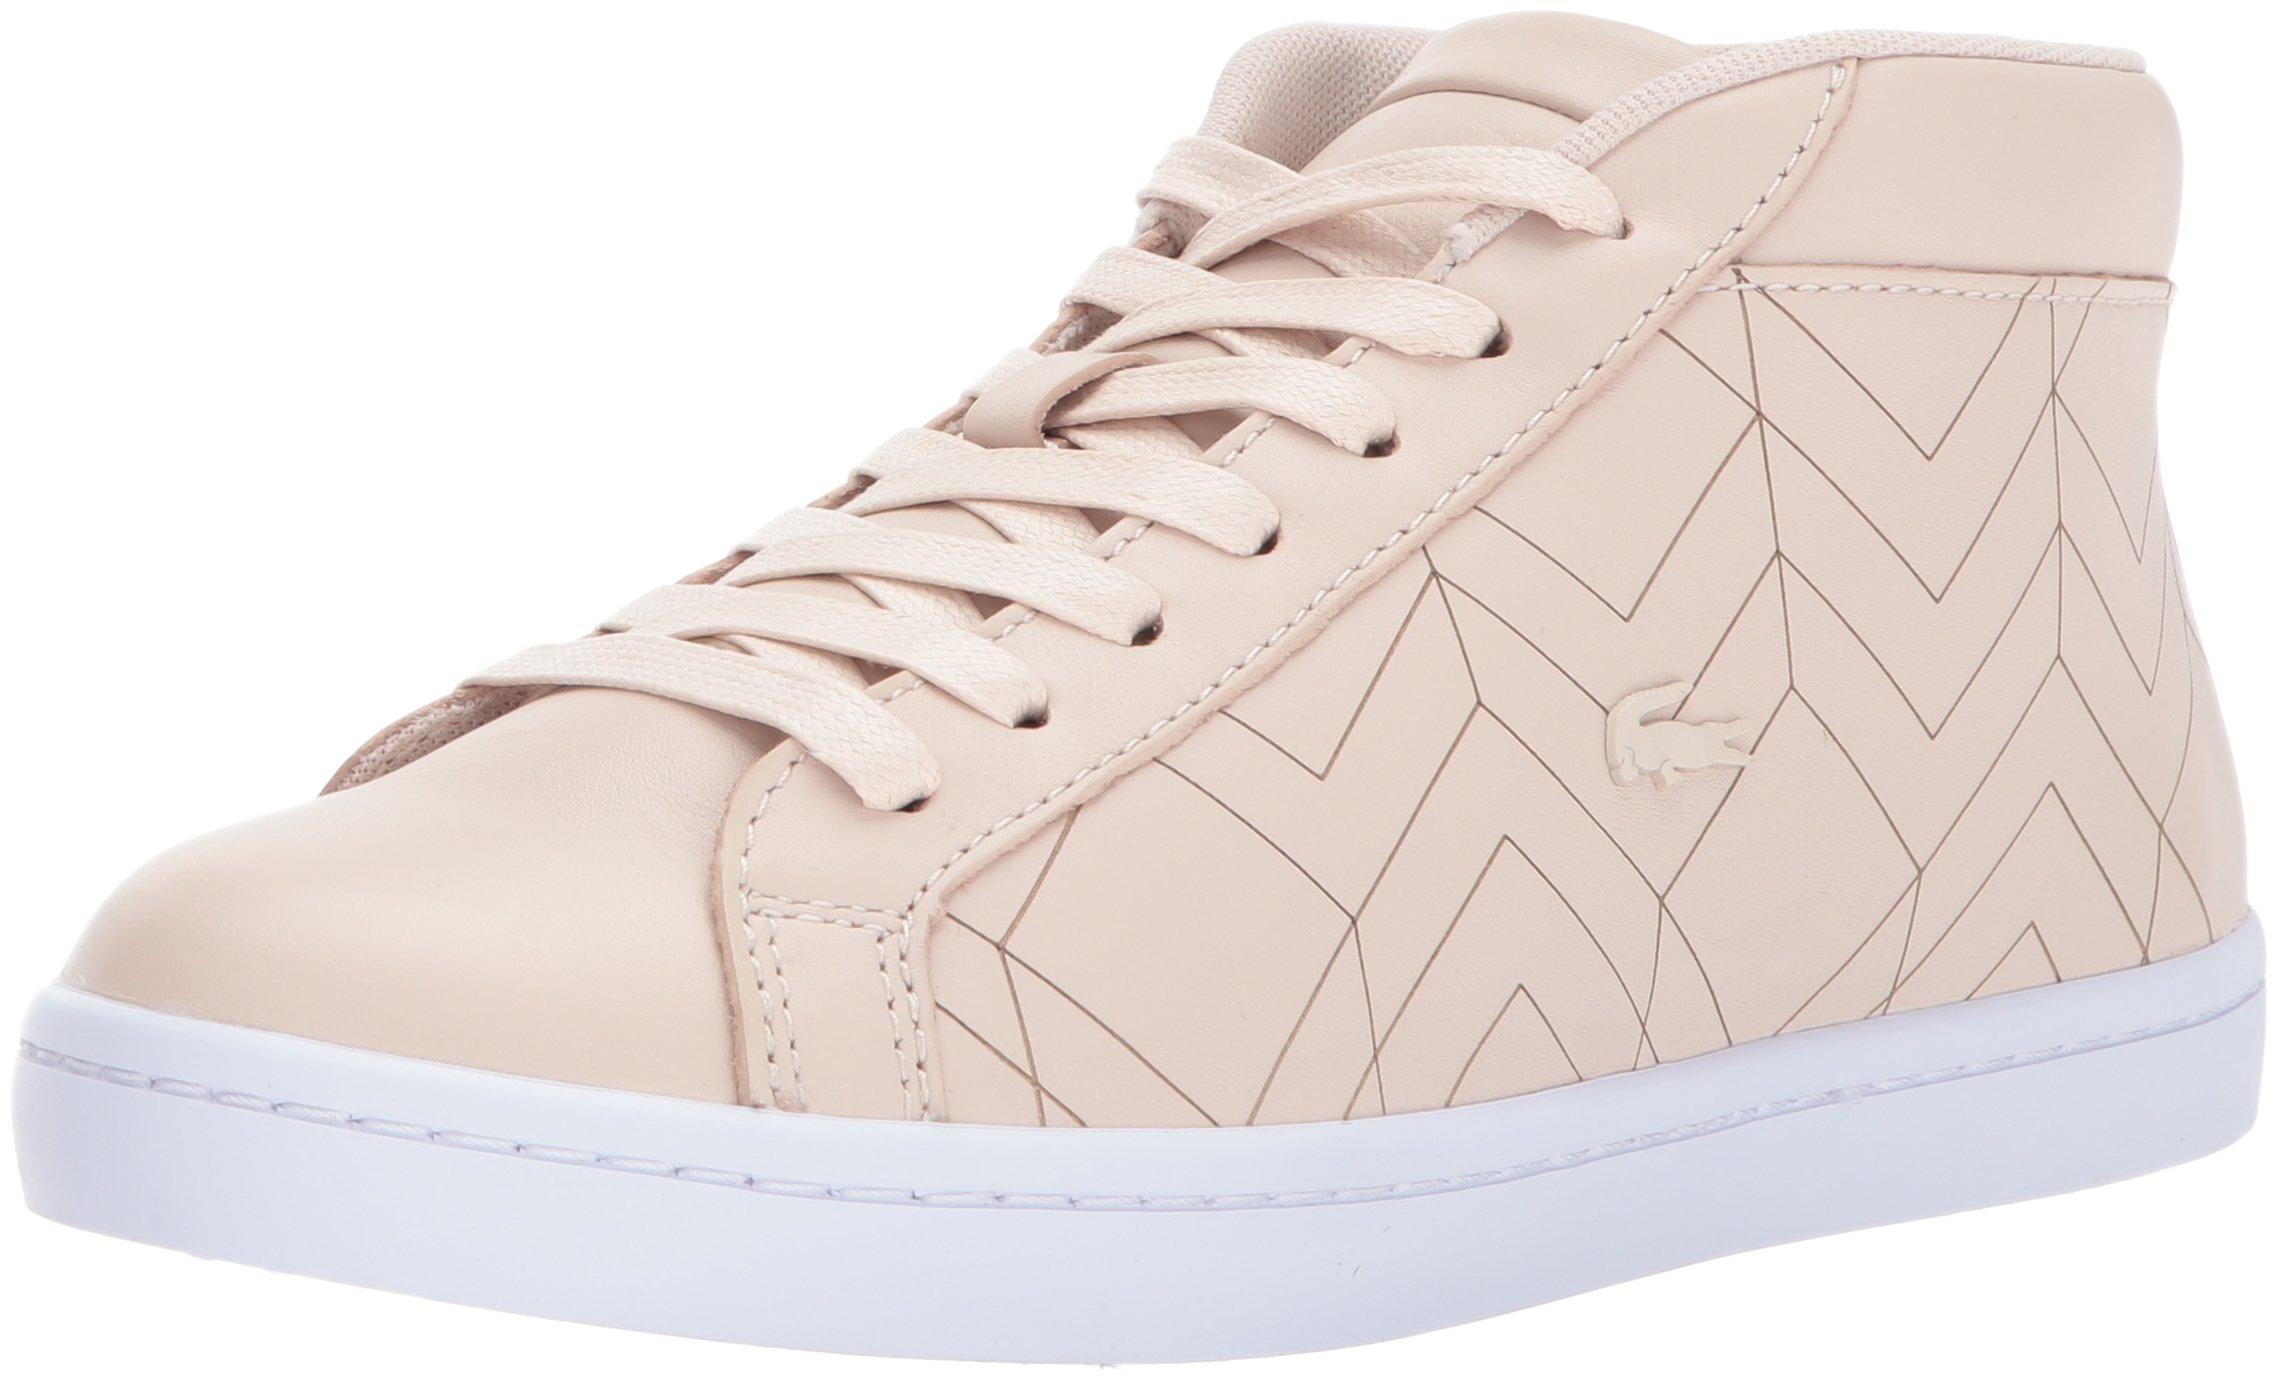 Lacoste Women's Straightset Chukka 417 1 Sneaker, Light Pink, 10 M US